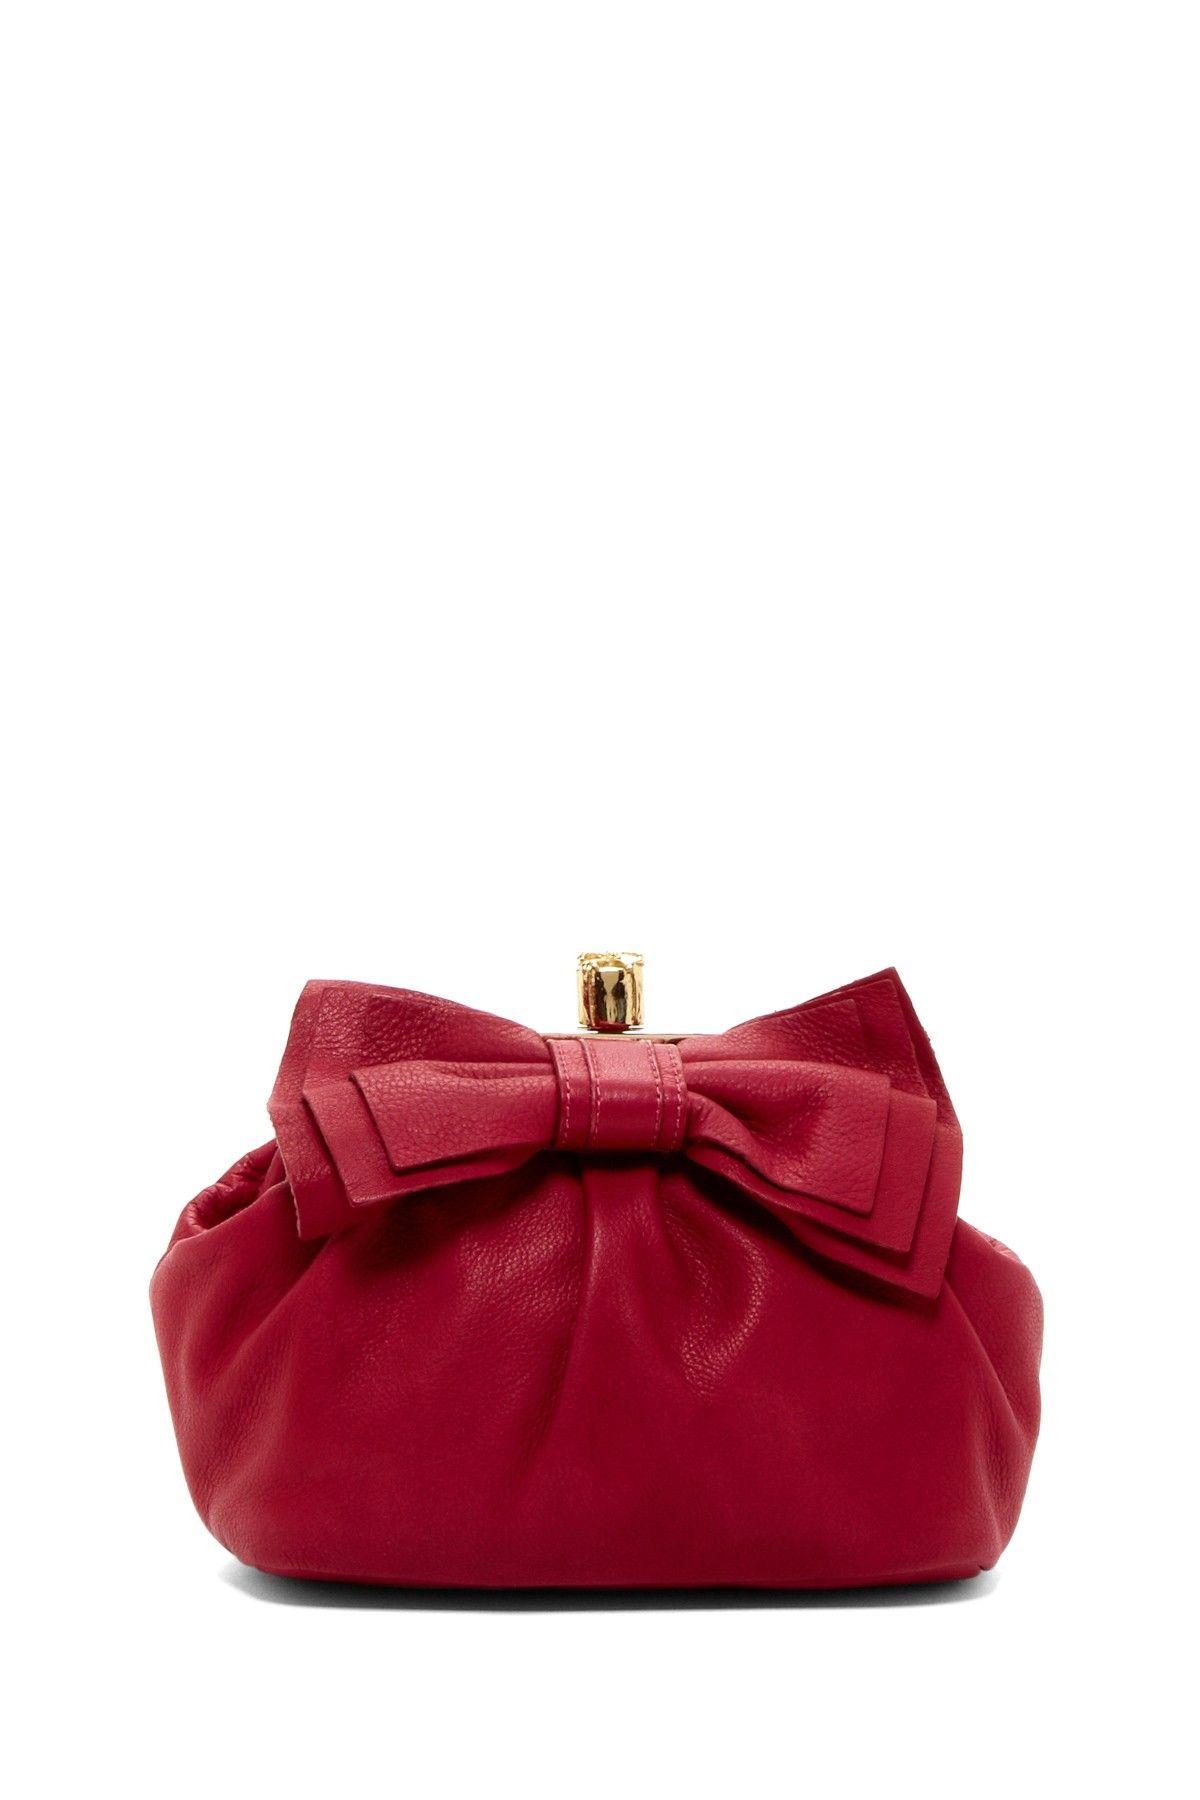 2e19909787 RED Valentino Framed Bow Shoulder Bag | BAGS | Fashion, Bags ...